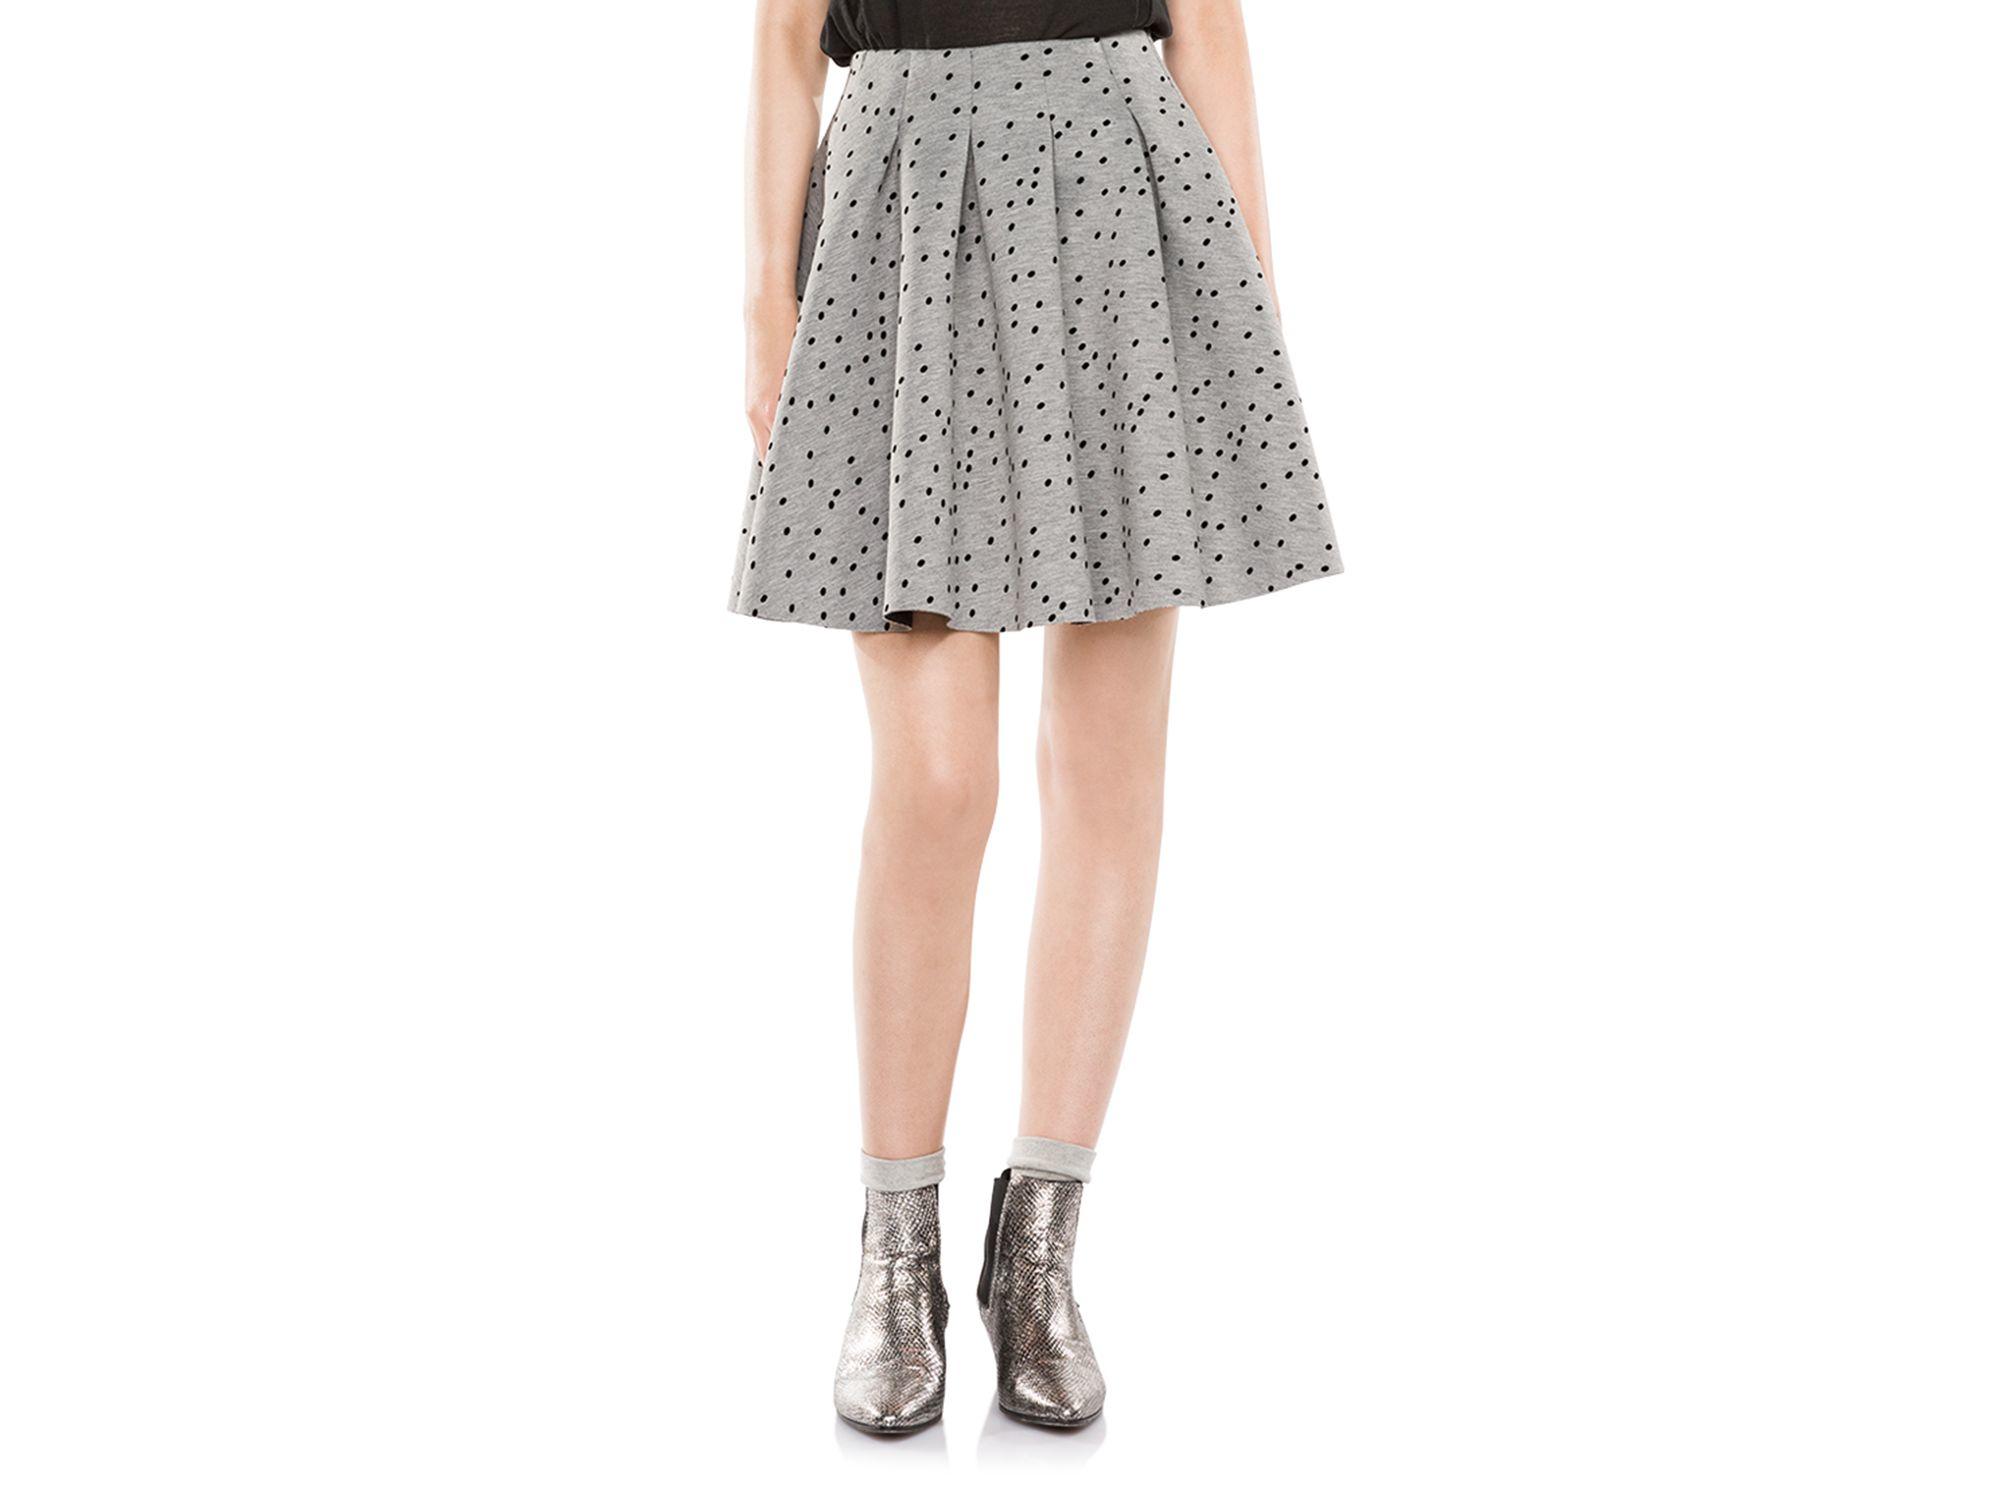 maje joye pleated polka dot skirt in gray lyst